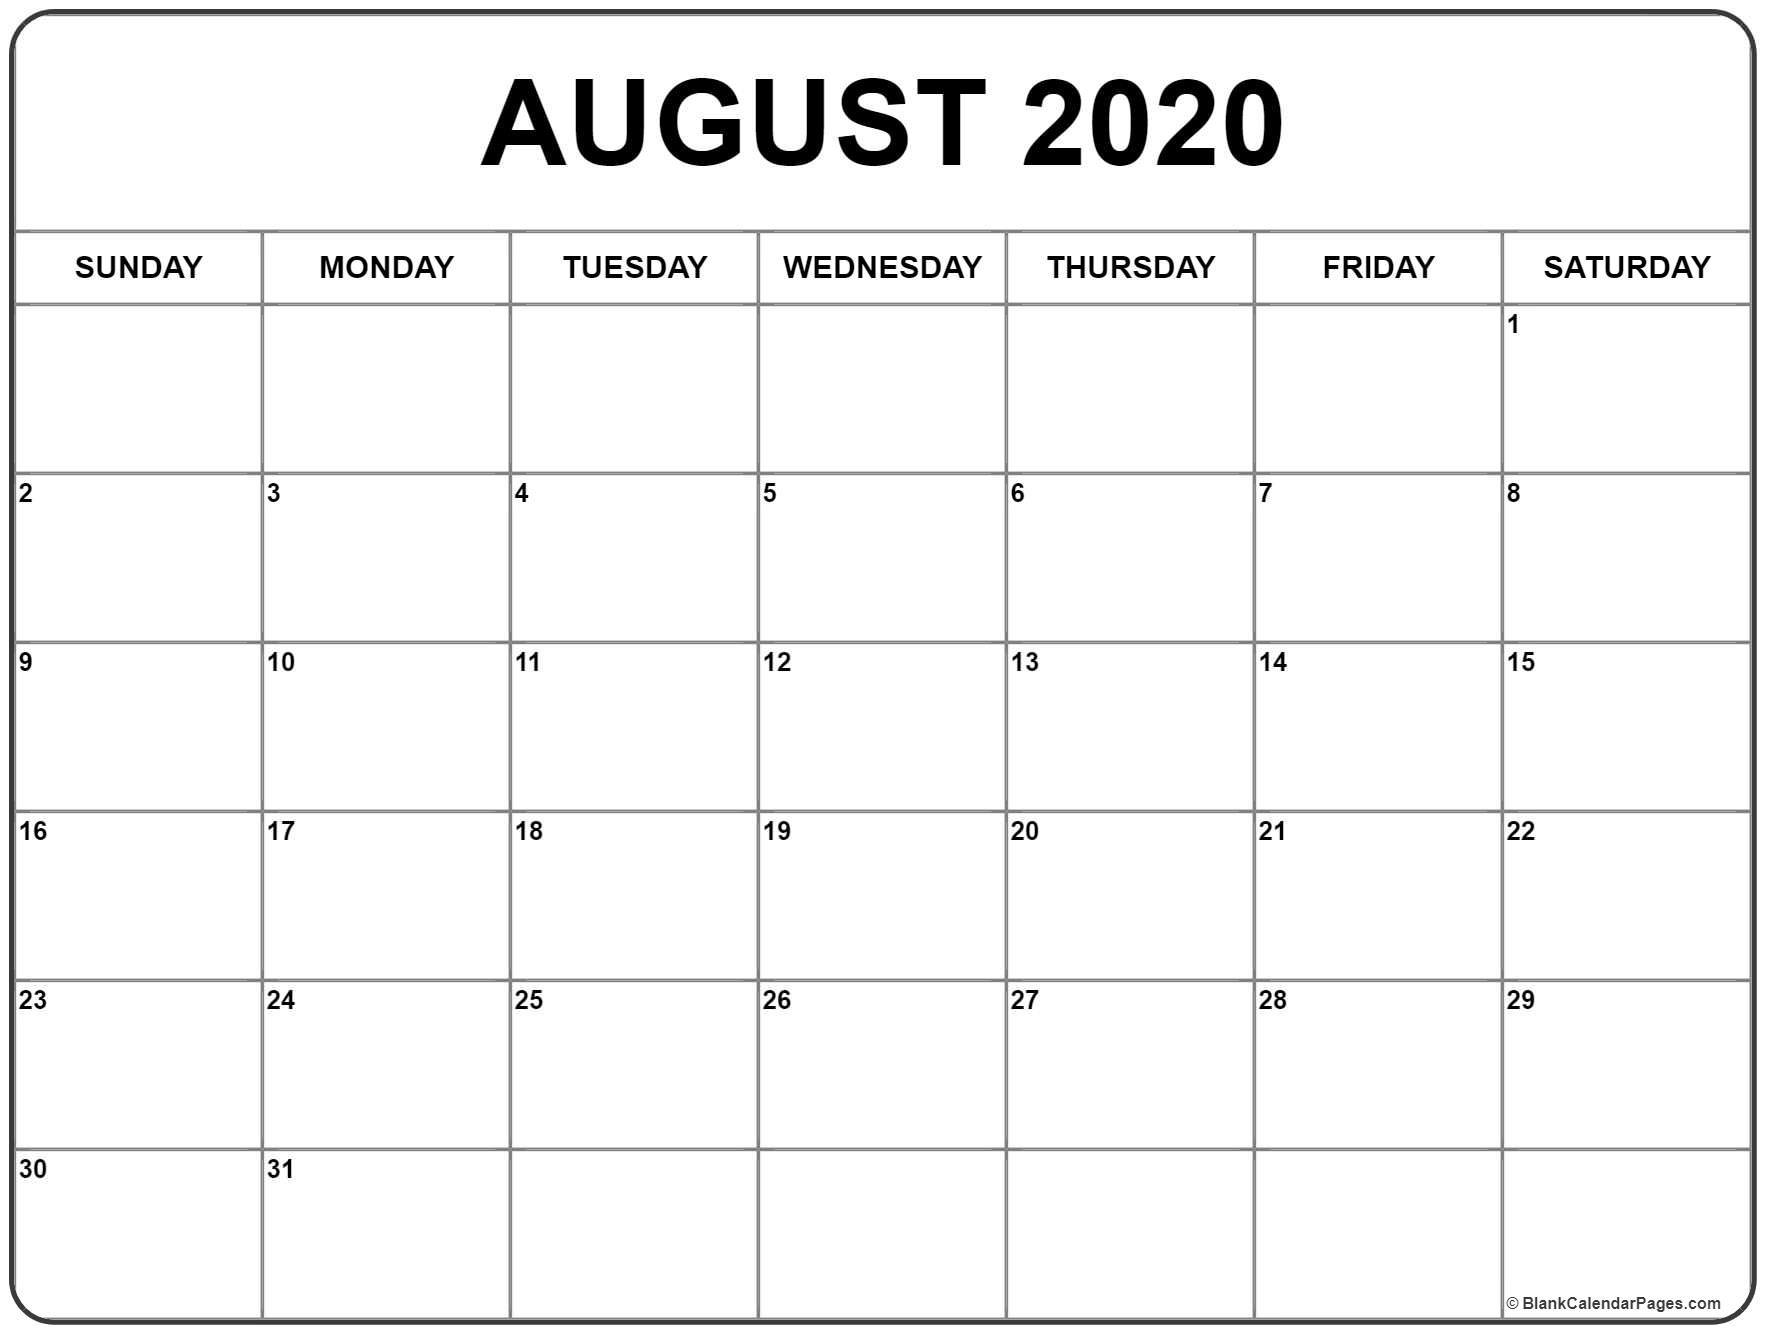 August 2020 Calendar | Free Printable Monthly Calendars-Blank Calendar June July August 2020